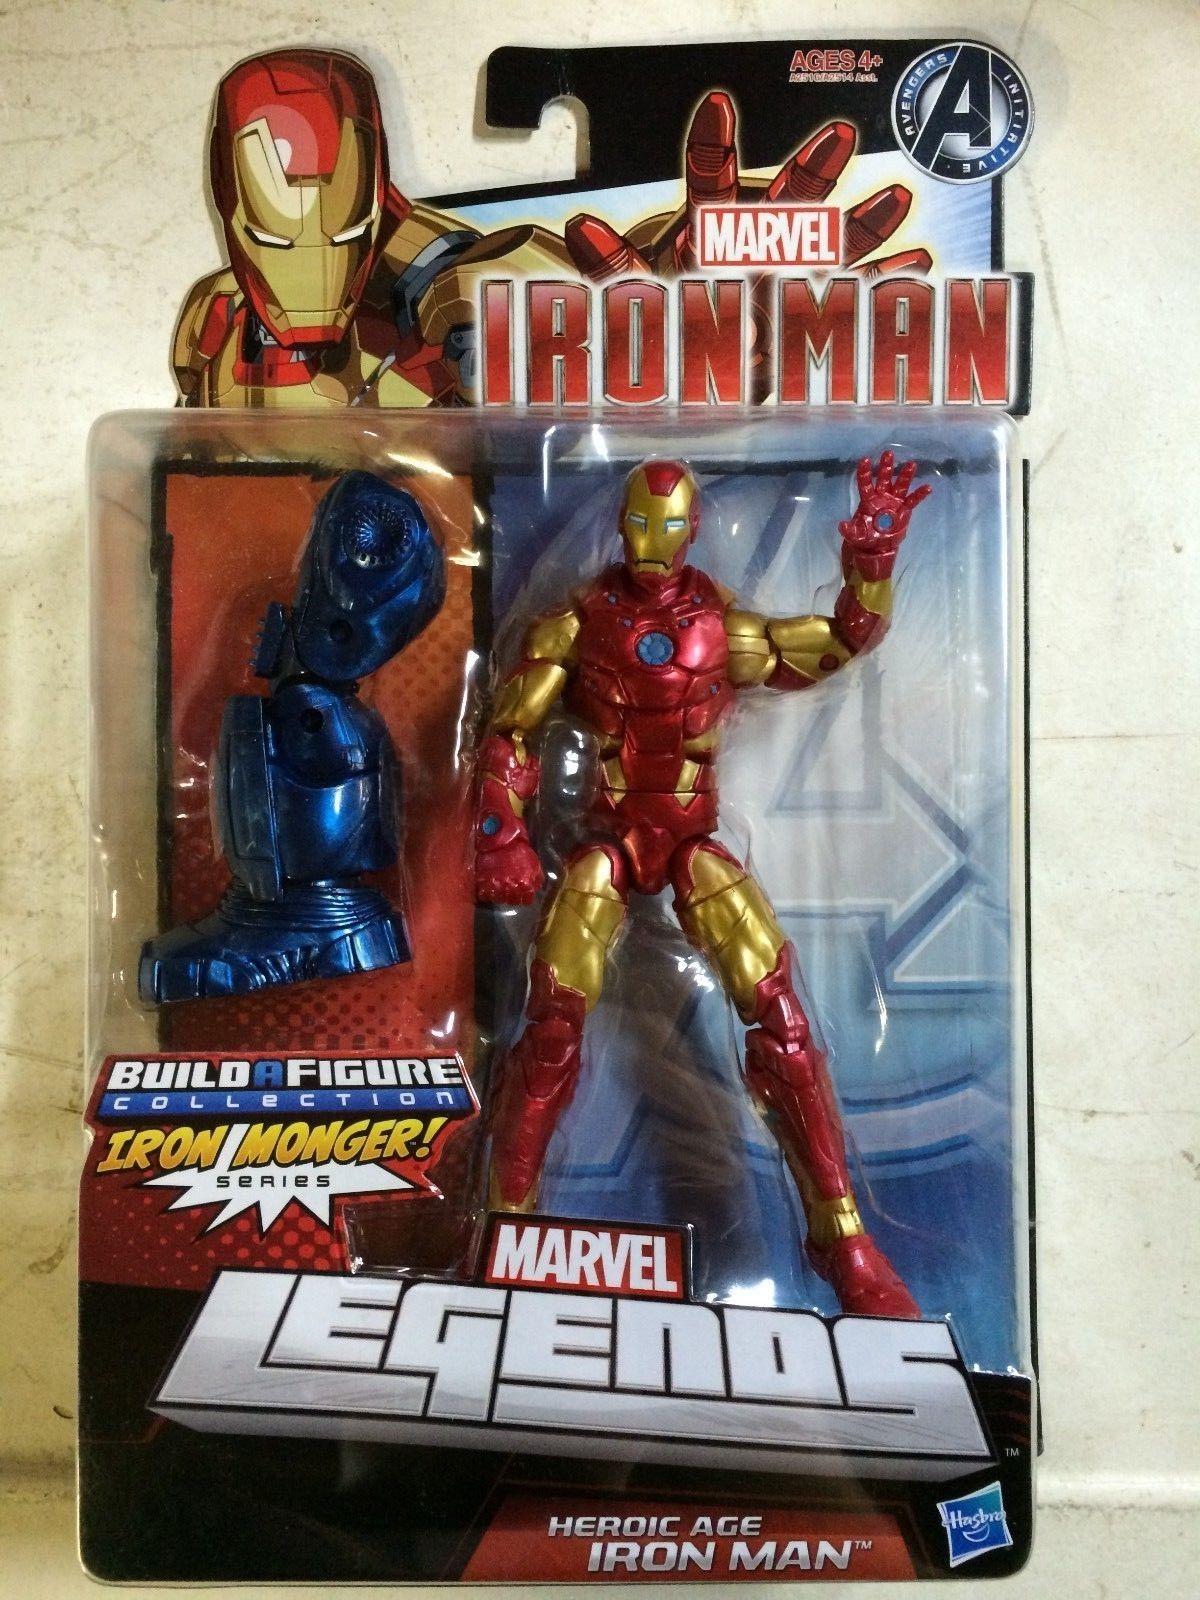 marvel select bleeding edge iron man exclusive figure released